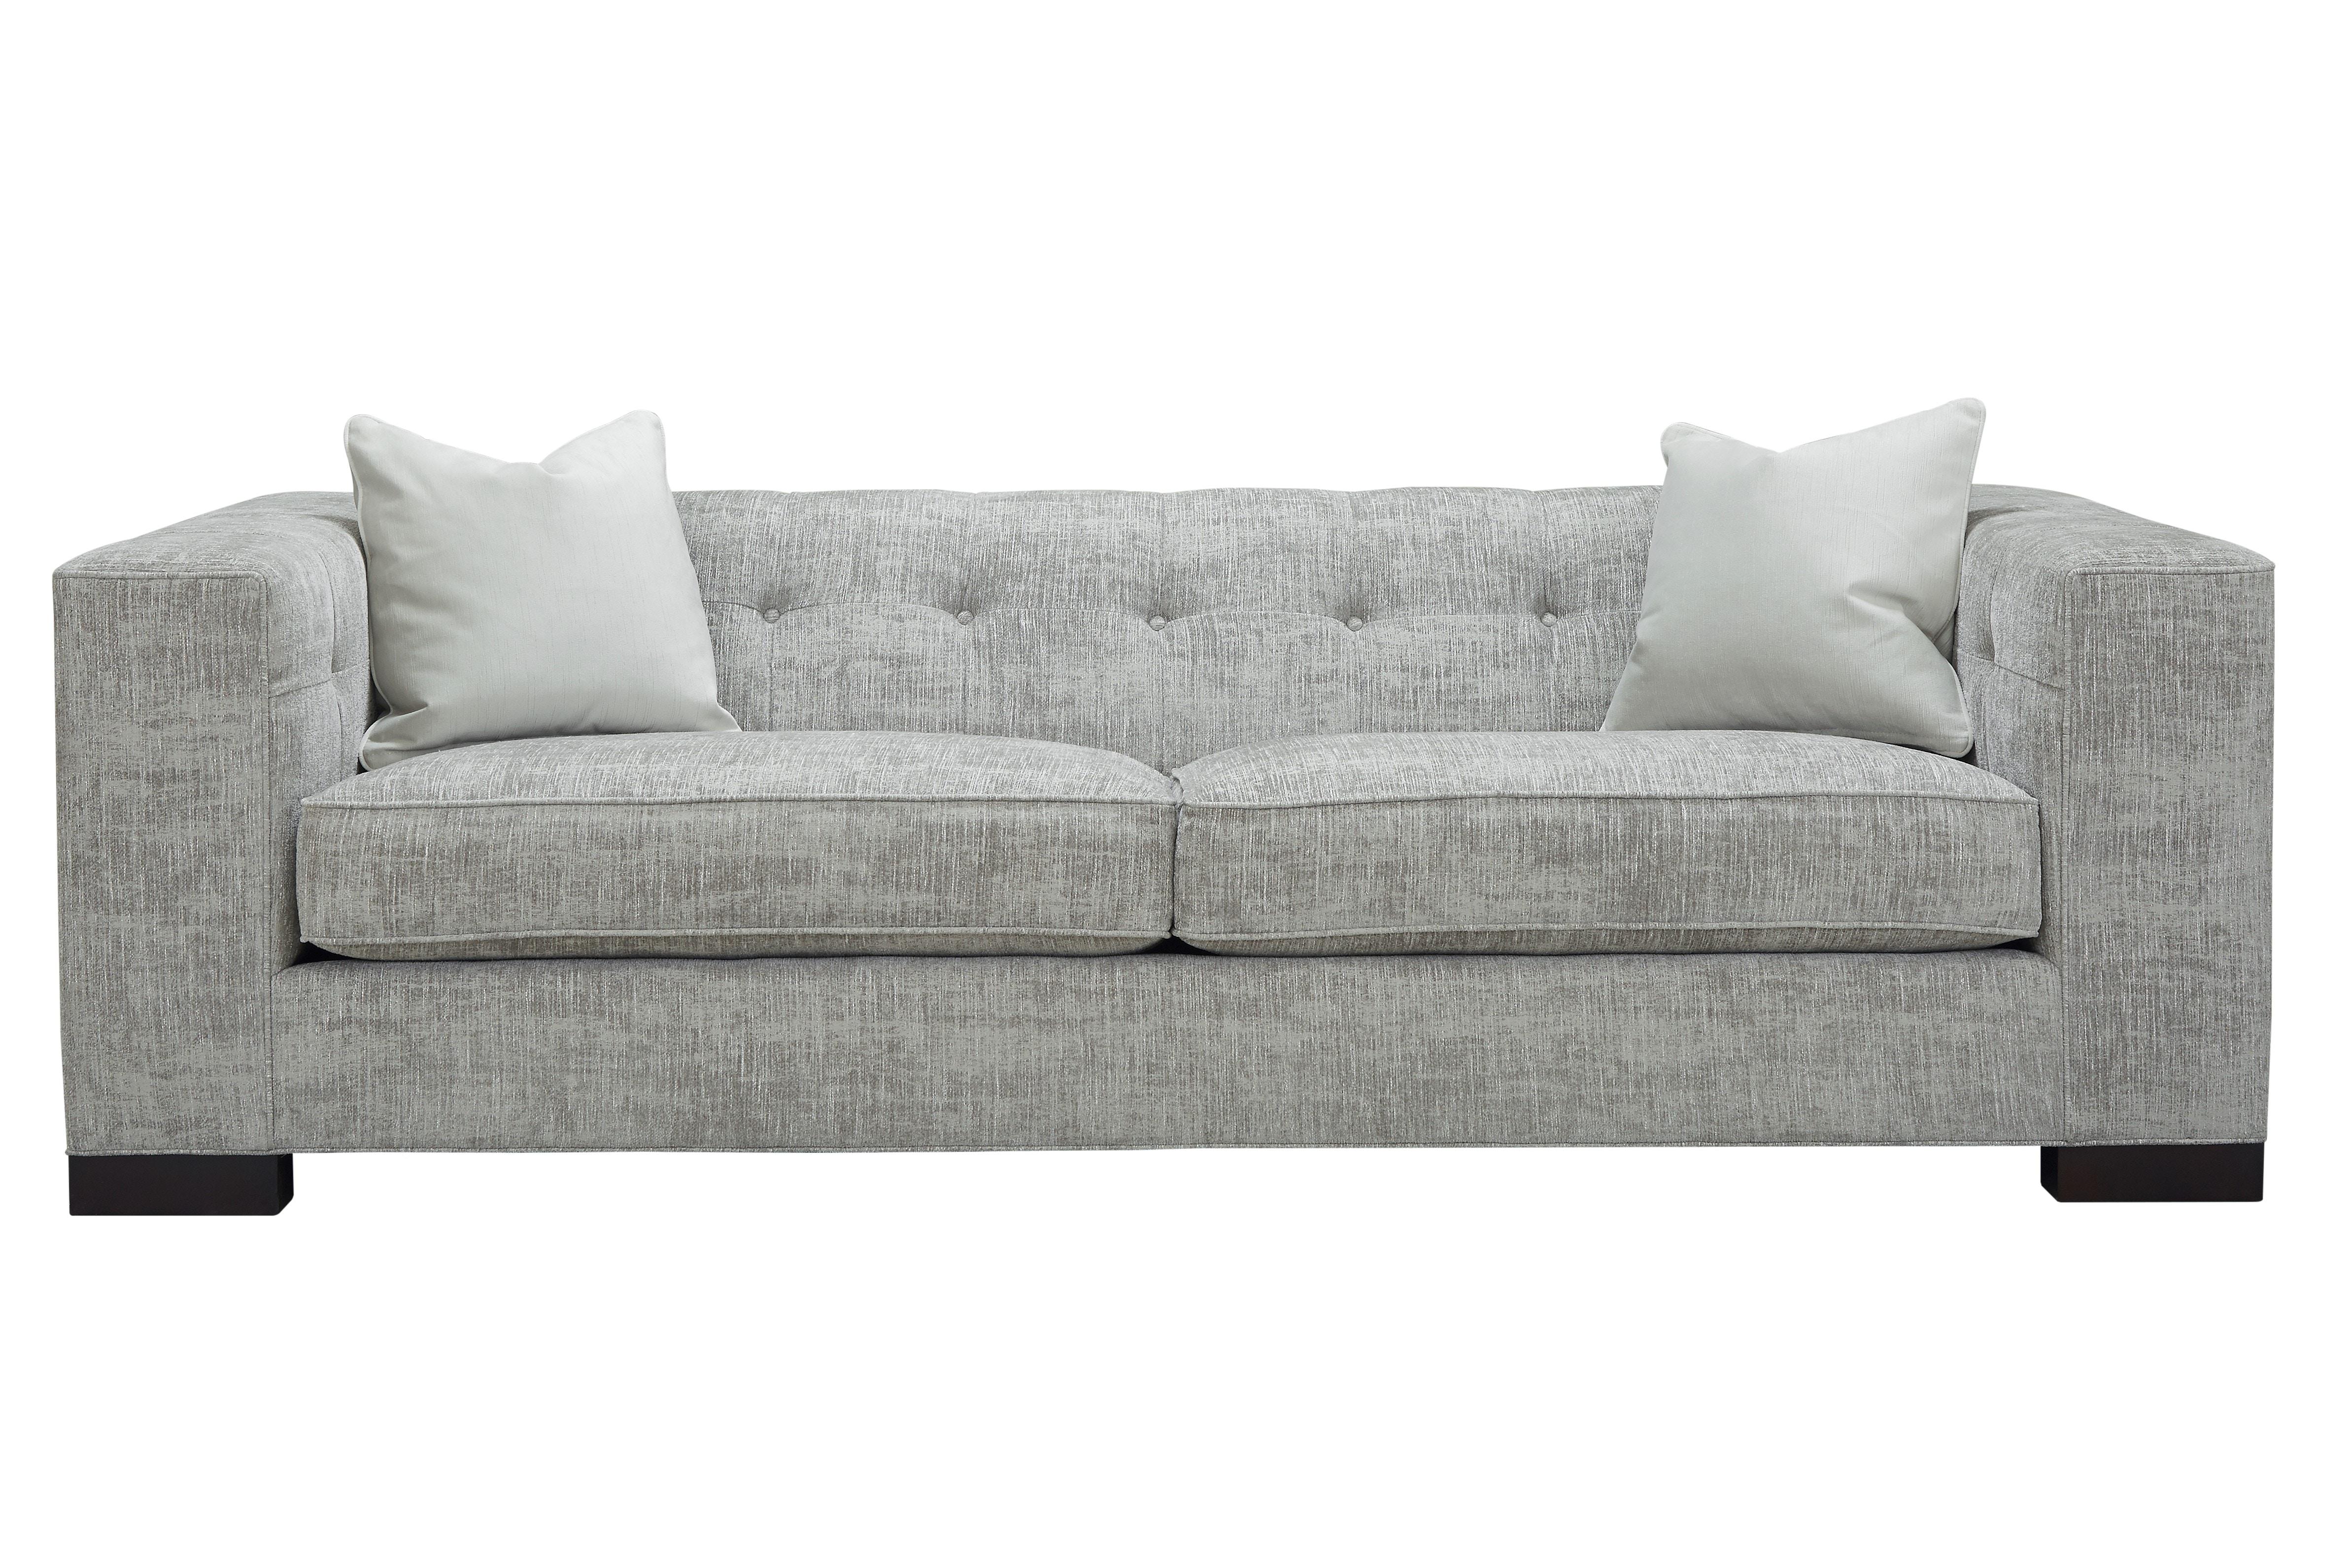 southern furniture gibson sofa james bed living room ashton 8ft 24581